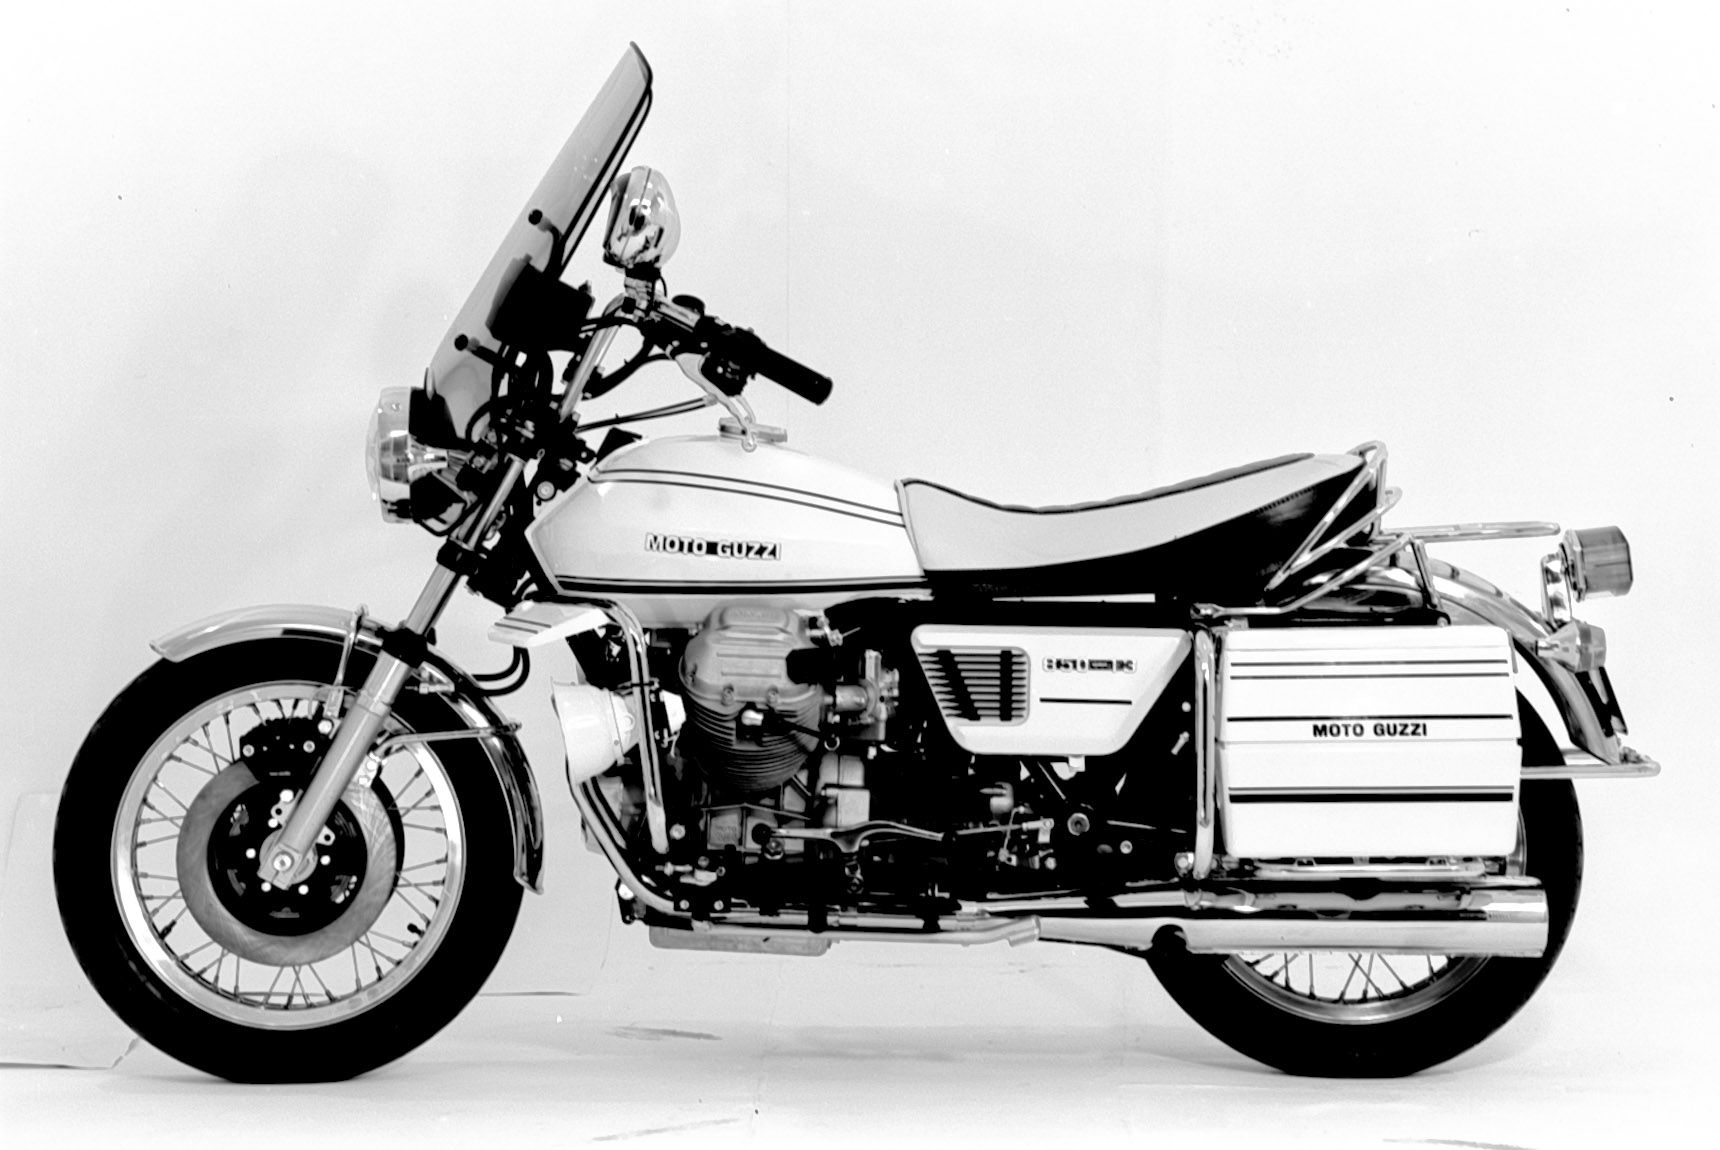 moto guzzi 850 t3 california police 1975 1980 vintage. Black Bedroom Furniture Sets. Home Design Ideas